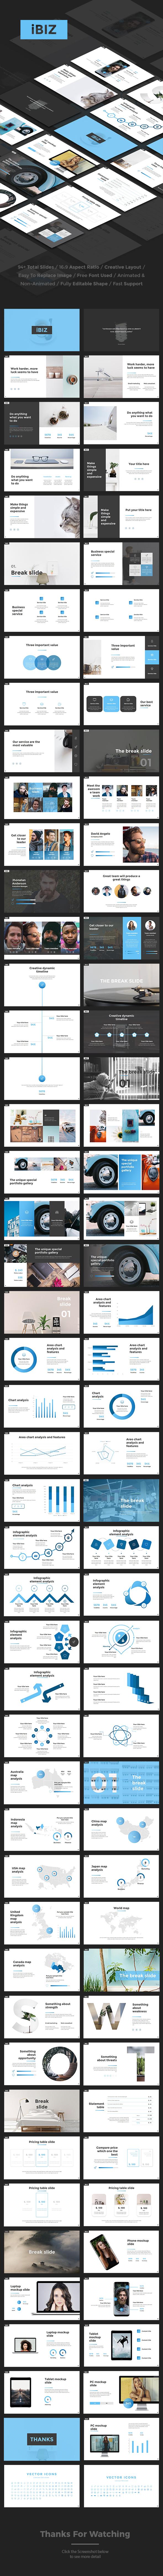 iBiz - Business Google Slides Template - Google Slides Presentation Templates